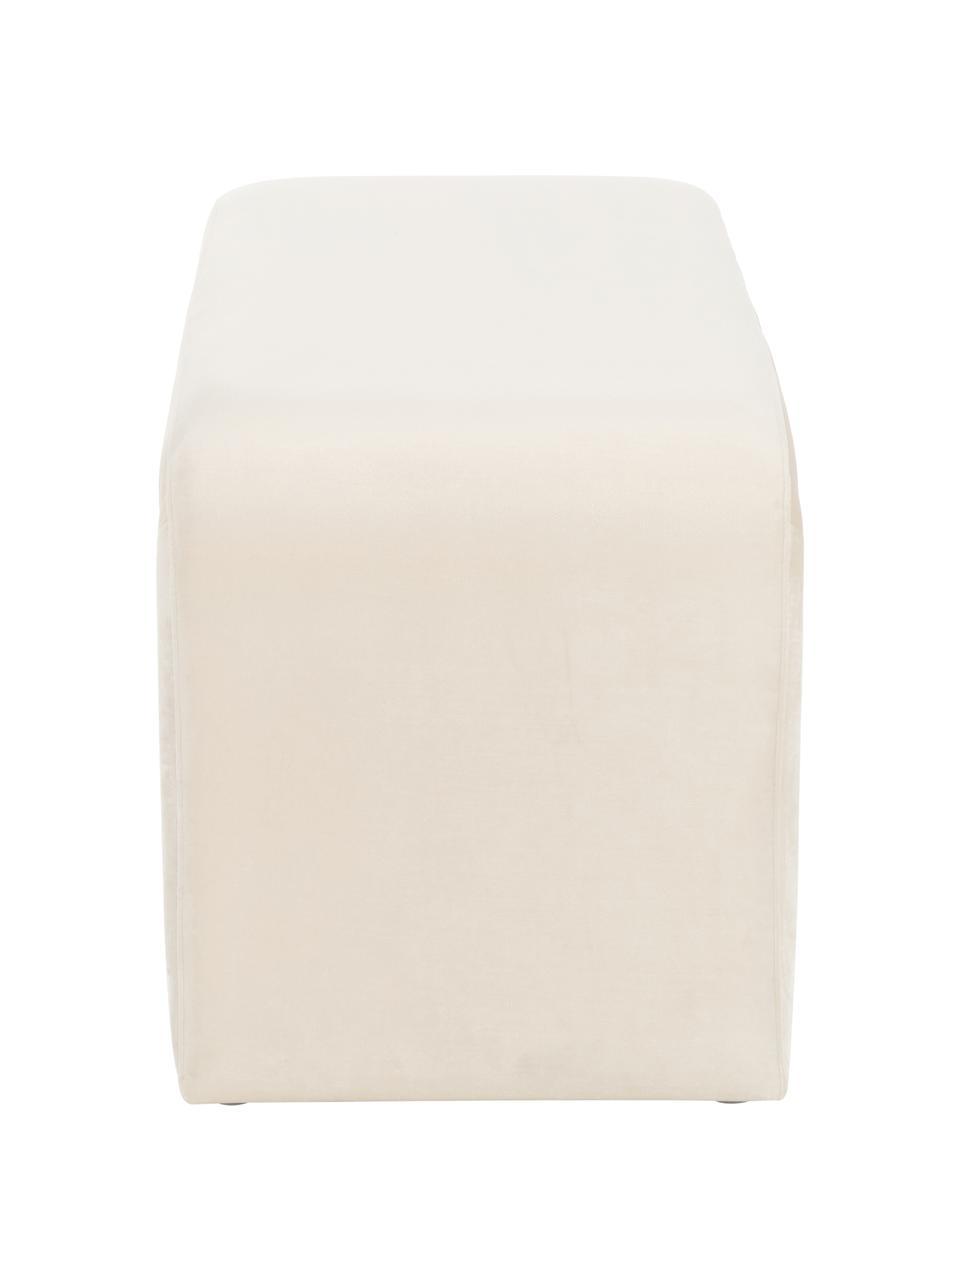 Moderne Samt-Polsterbank Penelope, Bezug: Samt (Polyester) 25.000 S, Gestell: Metall, Spanholz, Cremeweiß, 110 x 46 cm